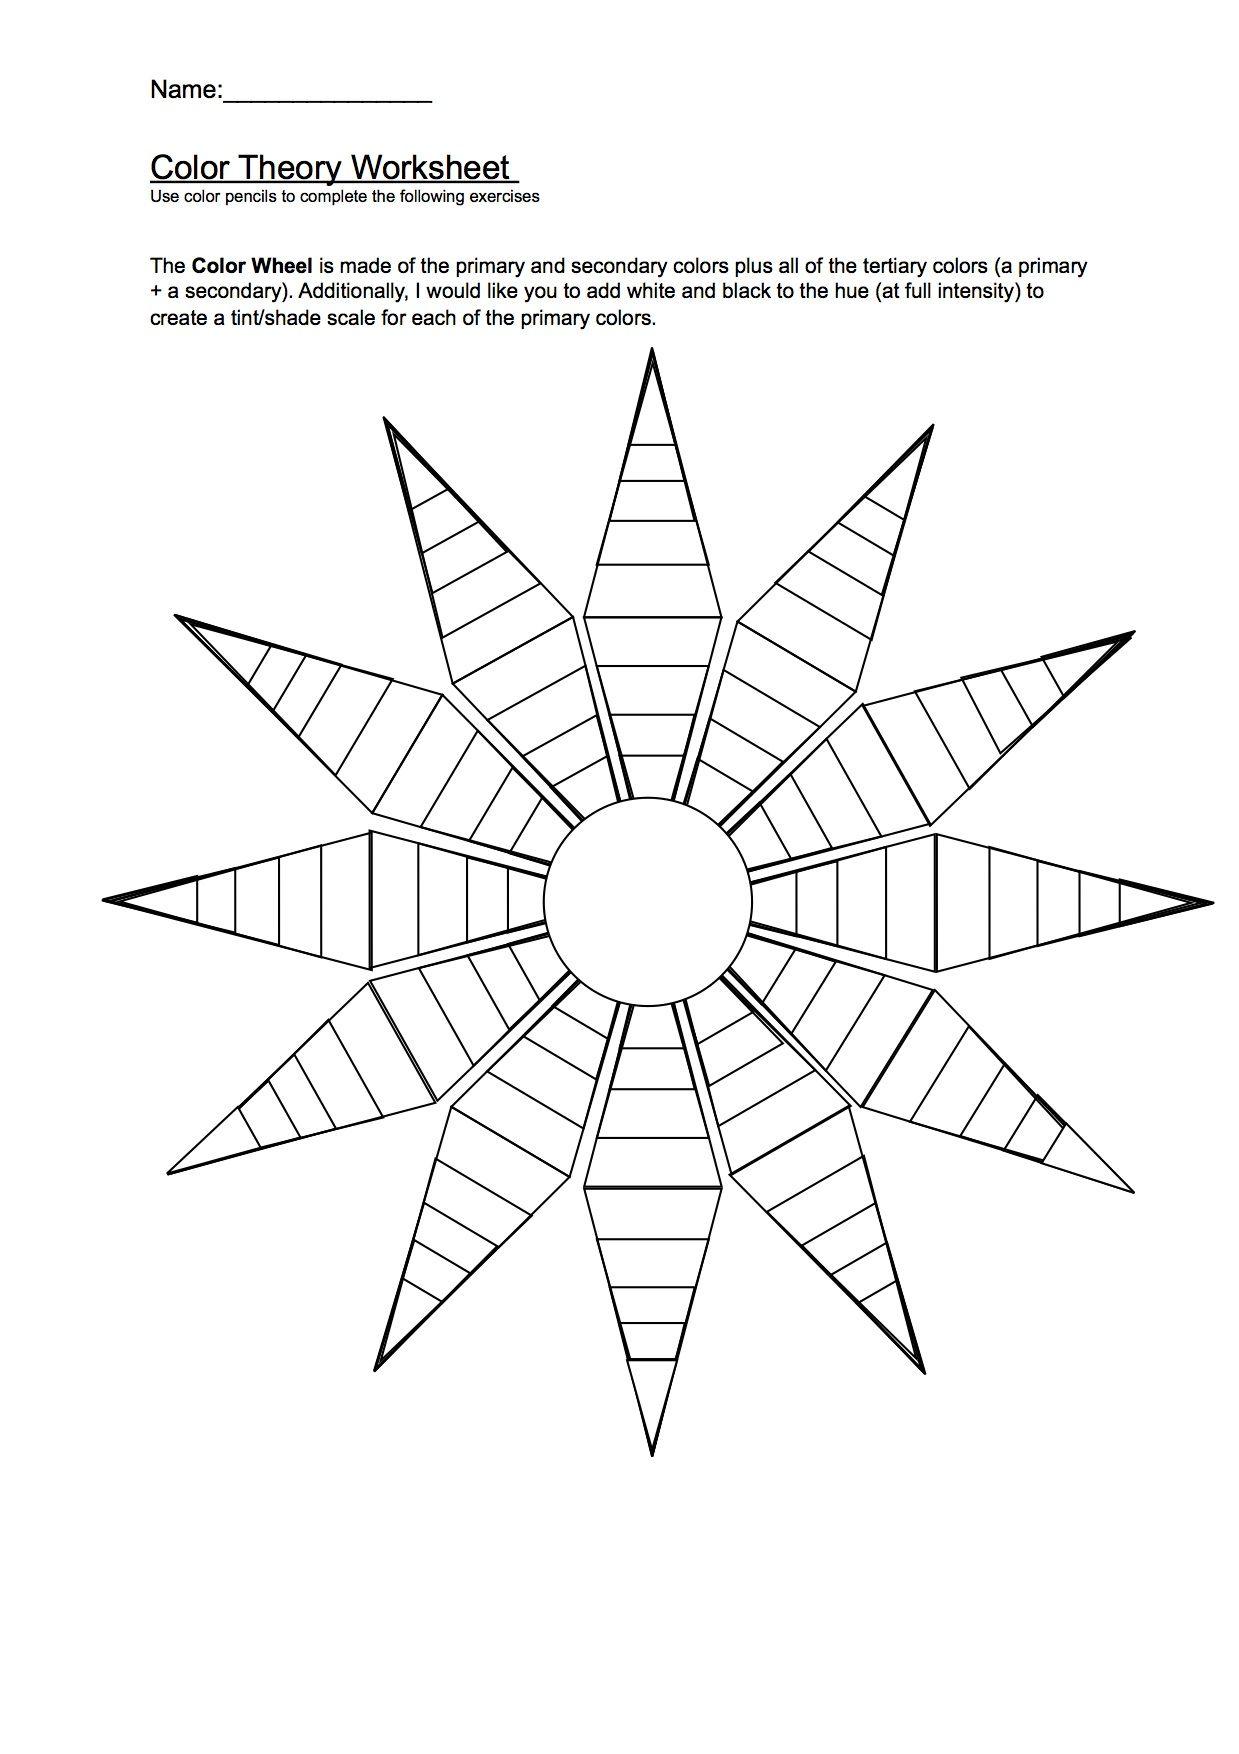 Color Wheel Worksheet   Art worksheets [ 1754 x 1239 Pixel ]